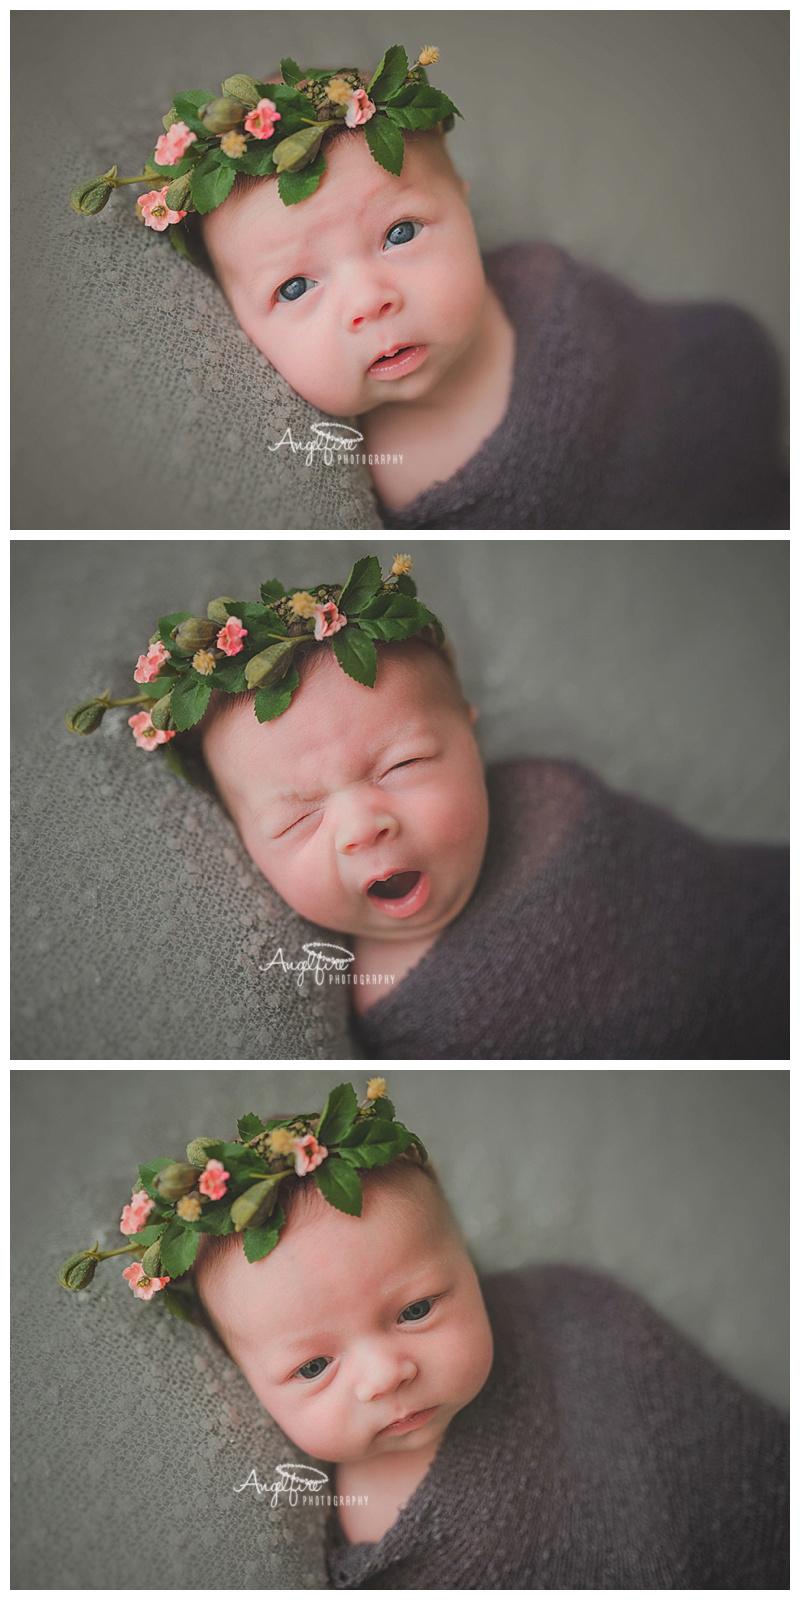 West Midlands Newborn Photographer | Angelfire Photography | www.angelfirephotography.co.uk 3